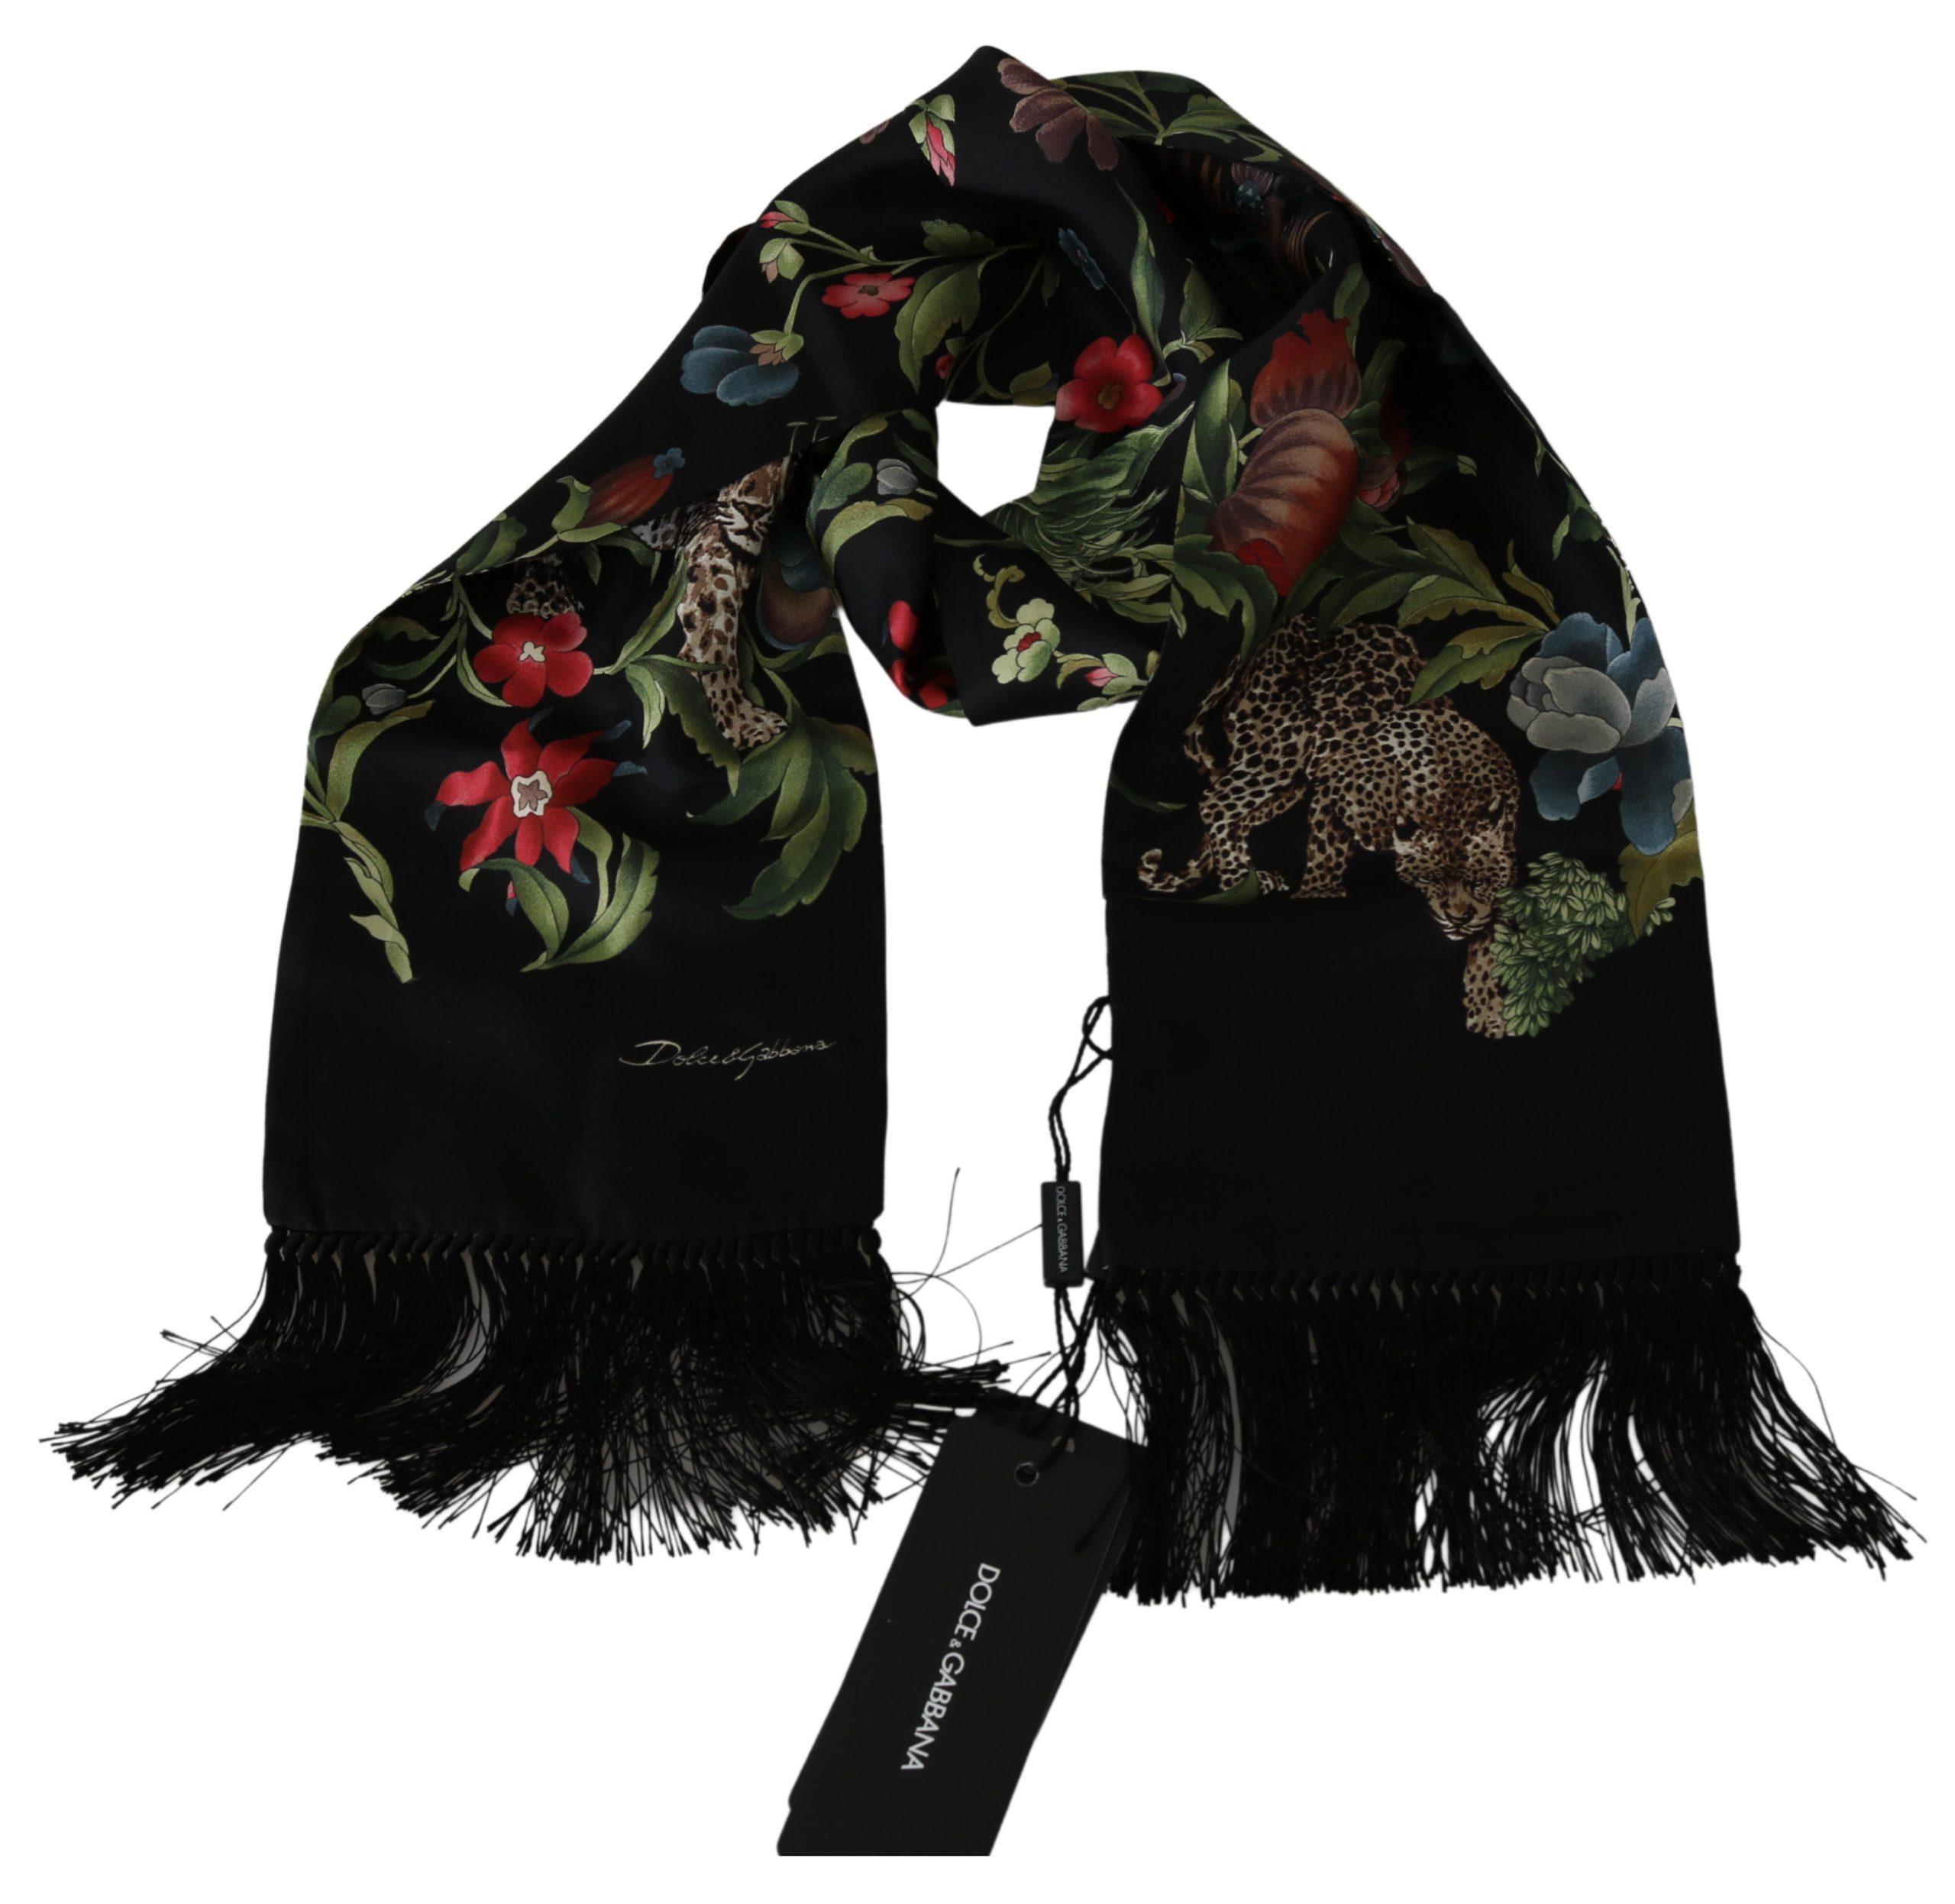 Dolce & Gabbana Men's Jungle Wrap Silk Scarf Black MS1744